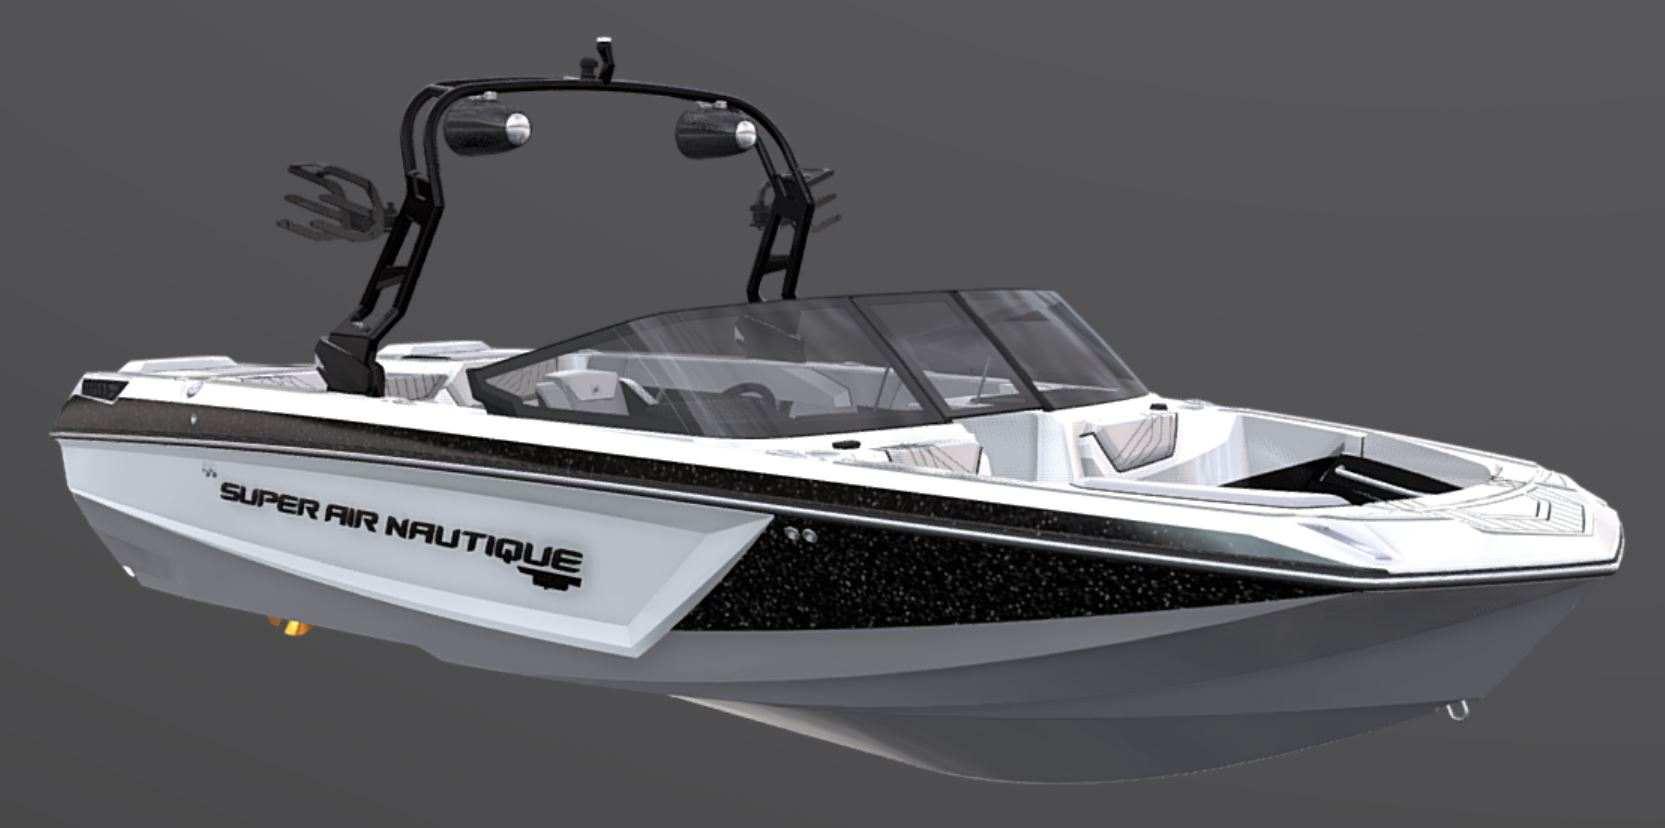 2021-Nautique-GS24-Jet-Black-Metal-Flake-Tungsten-Grey-Wake-Boat-1